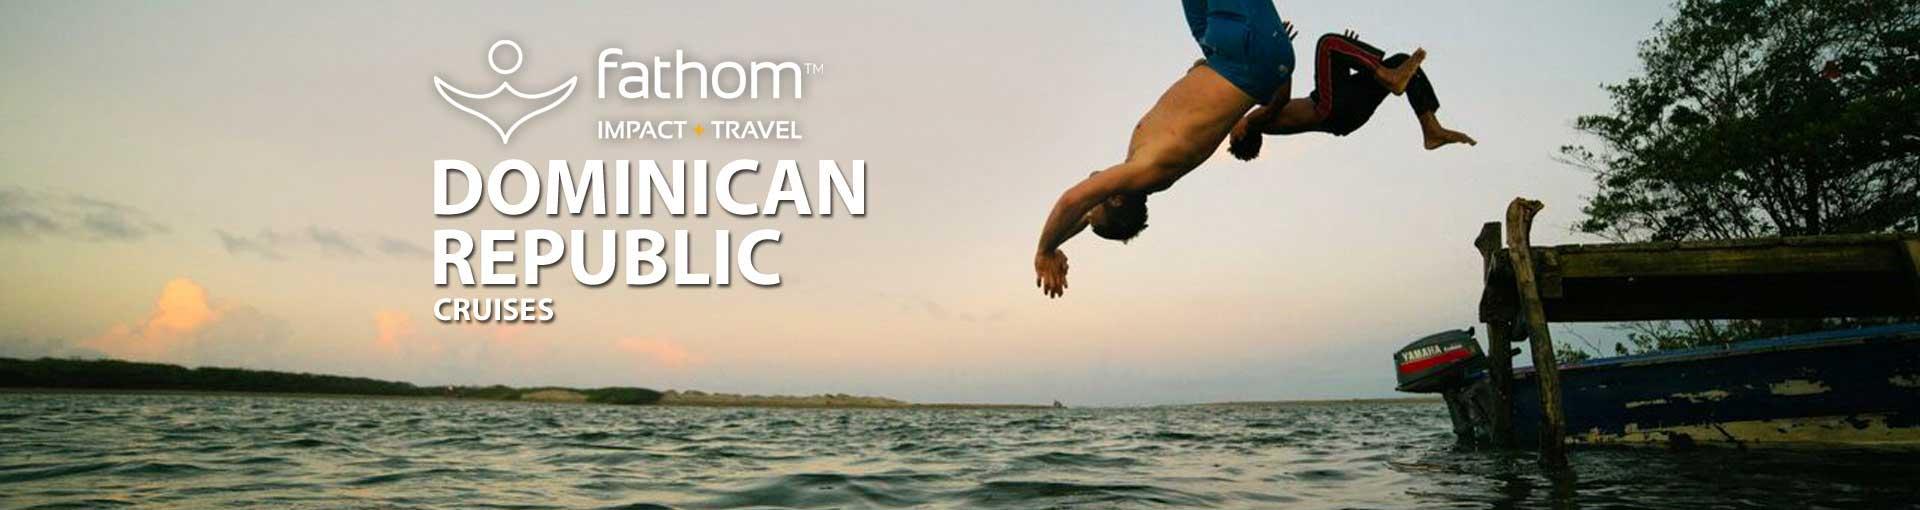 Fathom Dominican Republic Cruises